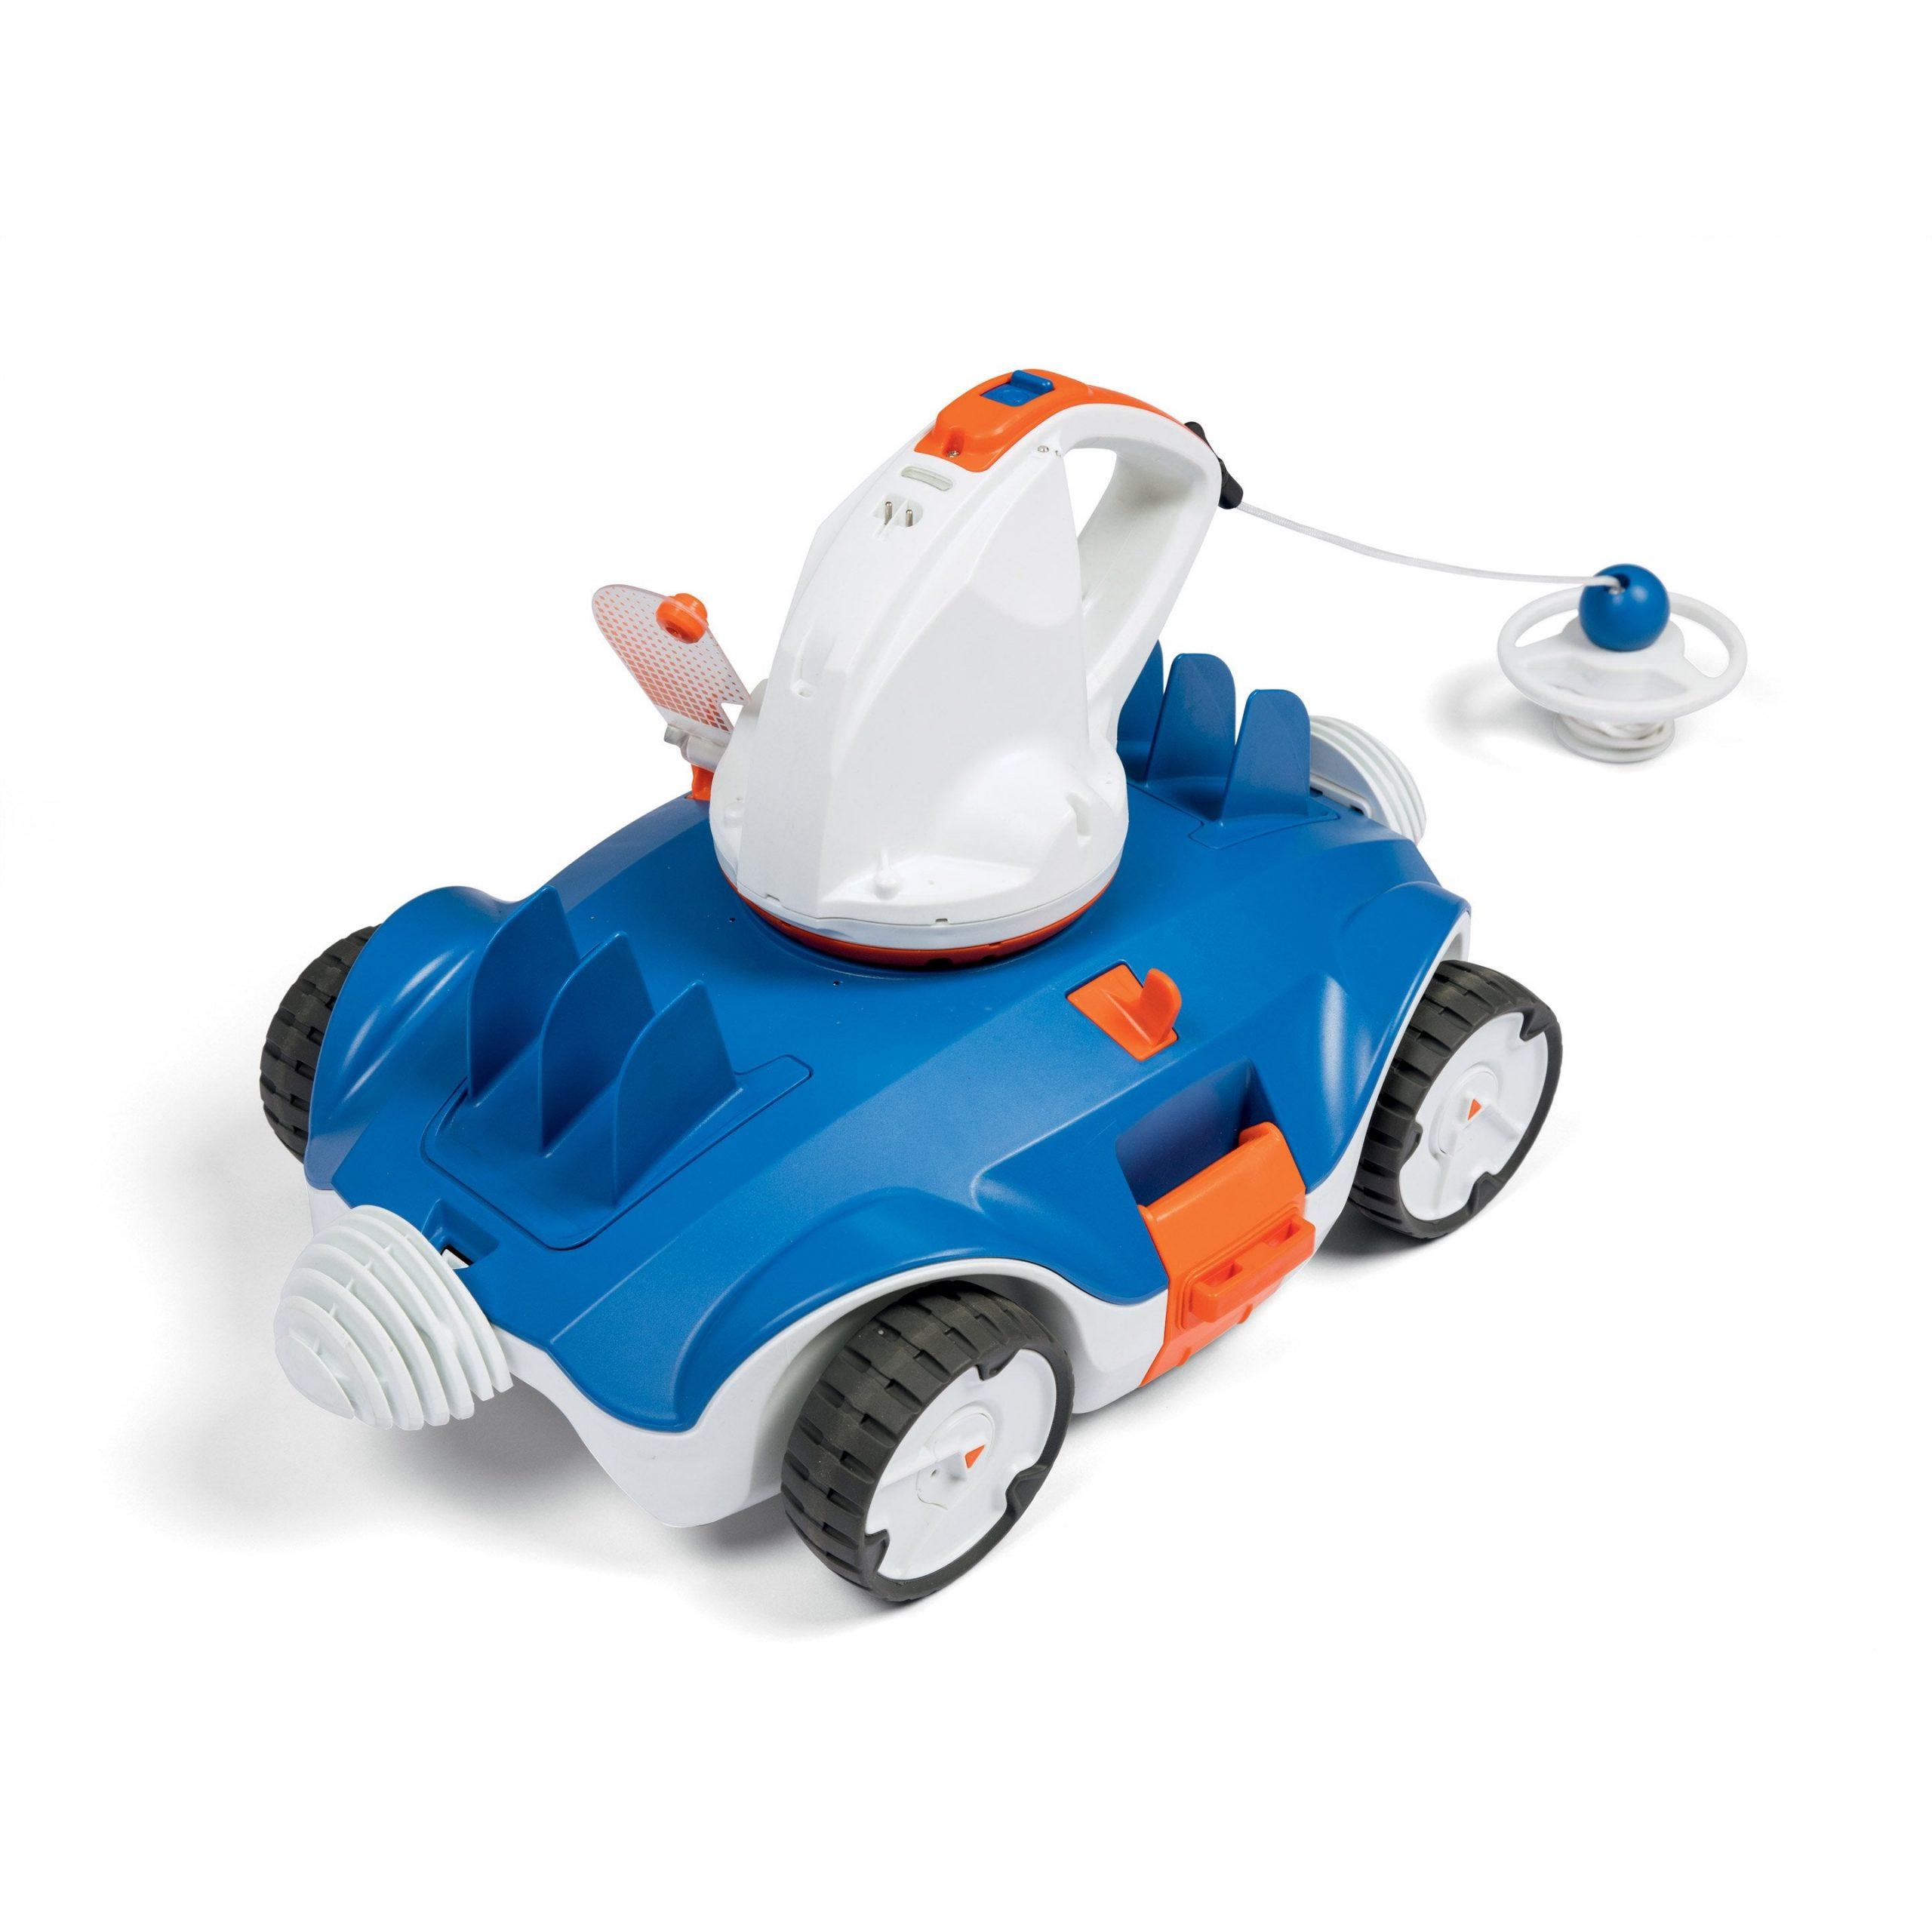 Robot De Piscine À Batterie Bestway Aquatronix | Robot De ... pour Robot Piscine Leroy Merlin